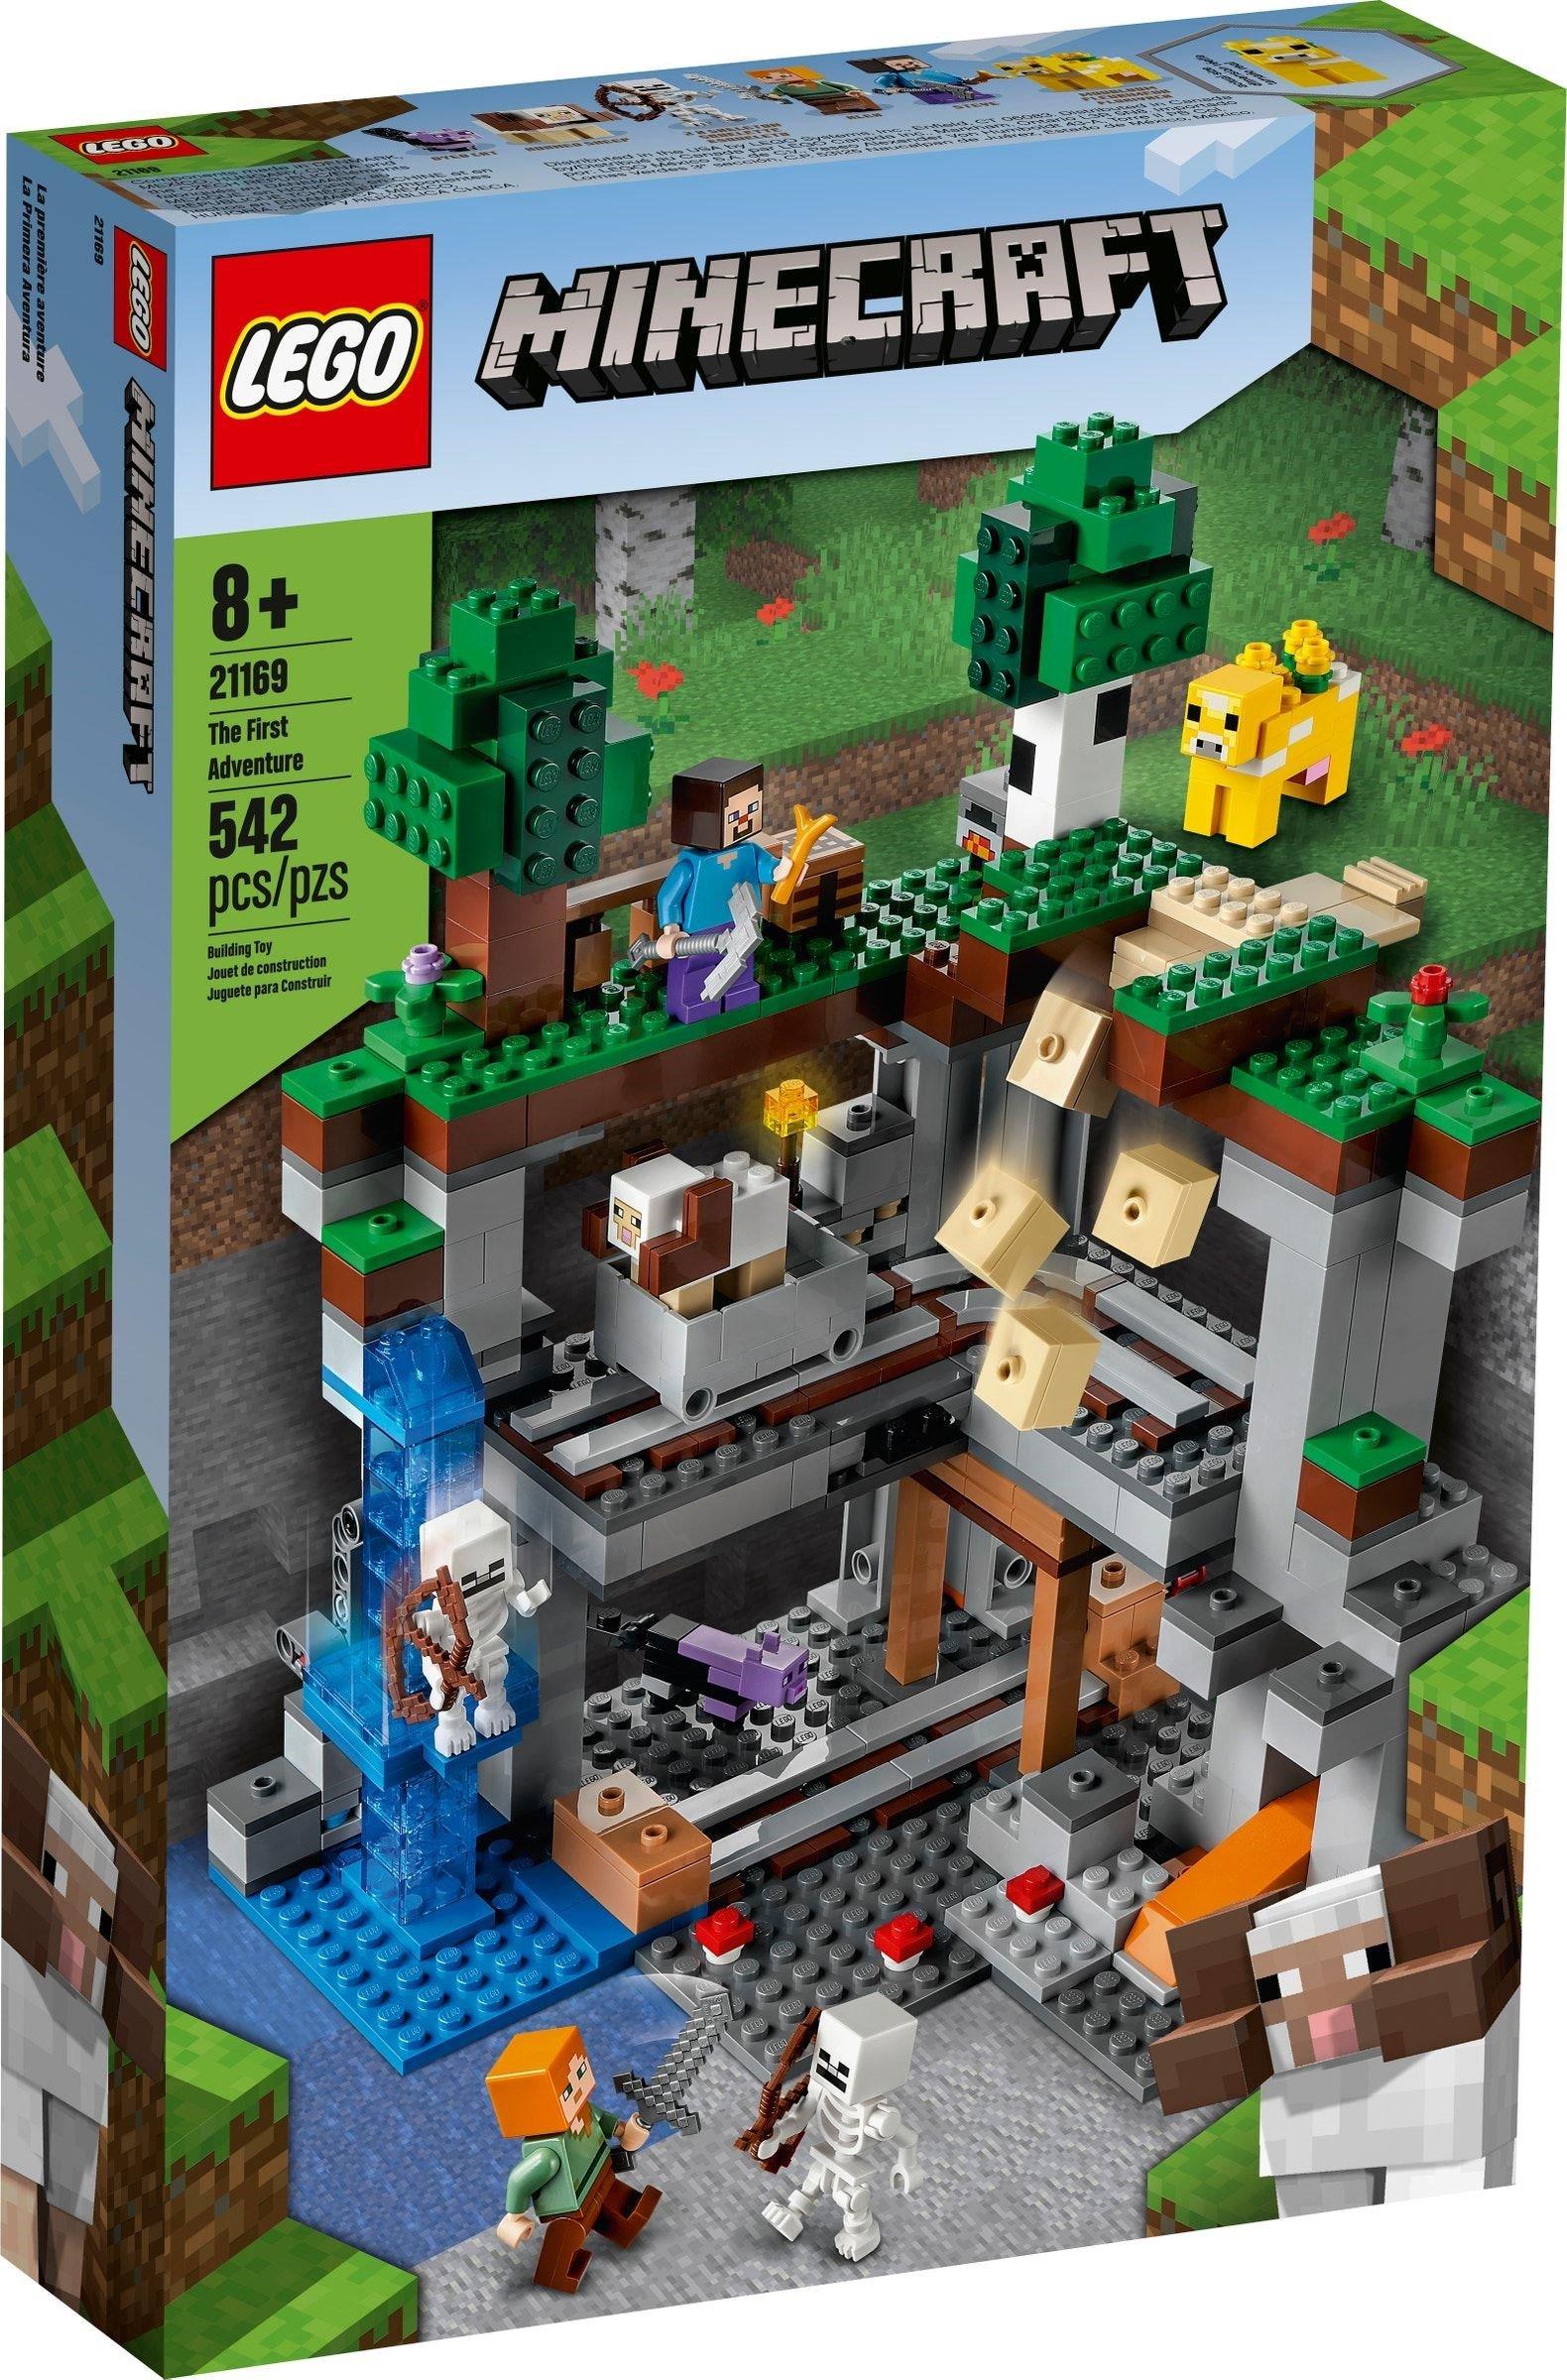 LEGO Minecraft - The First Adventure (21169)